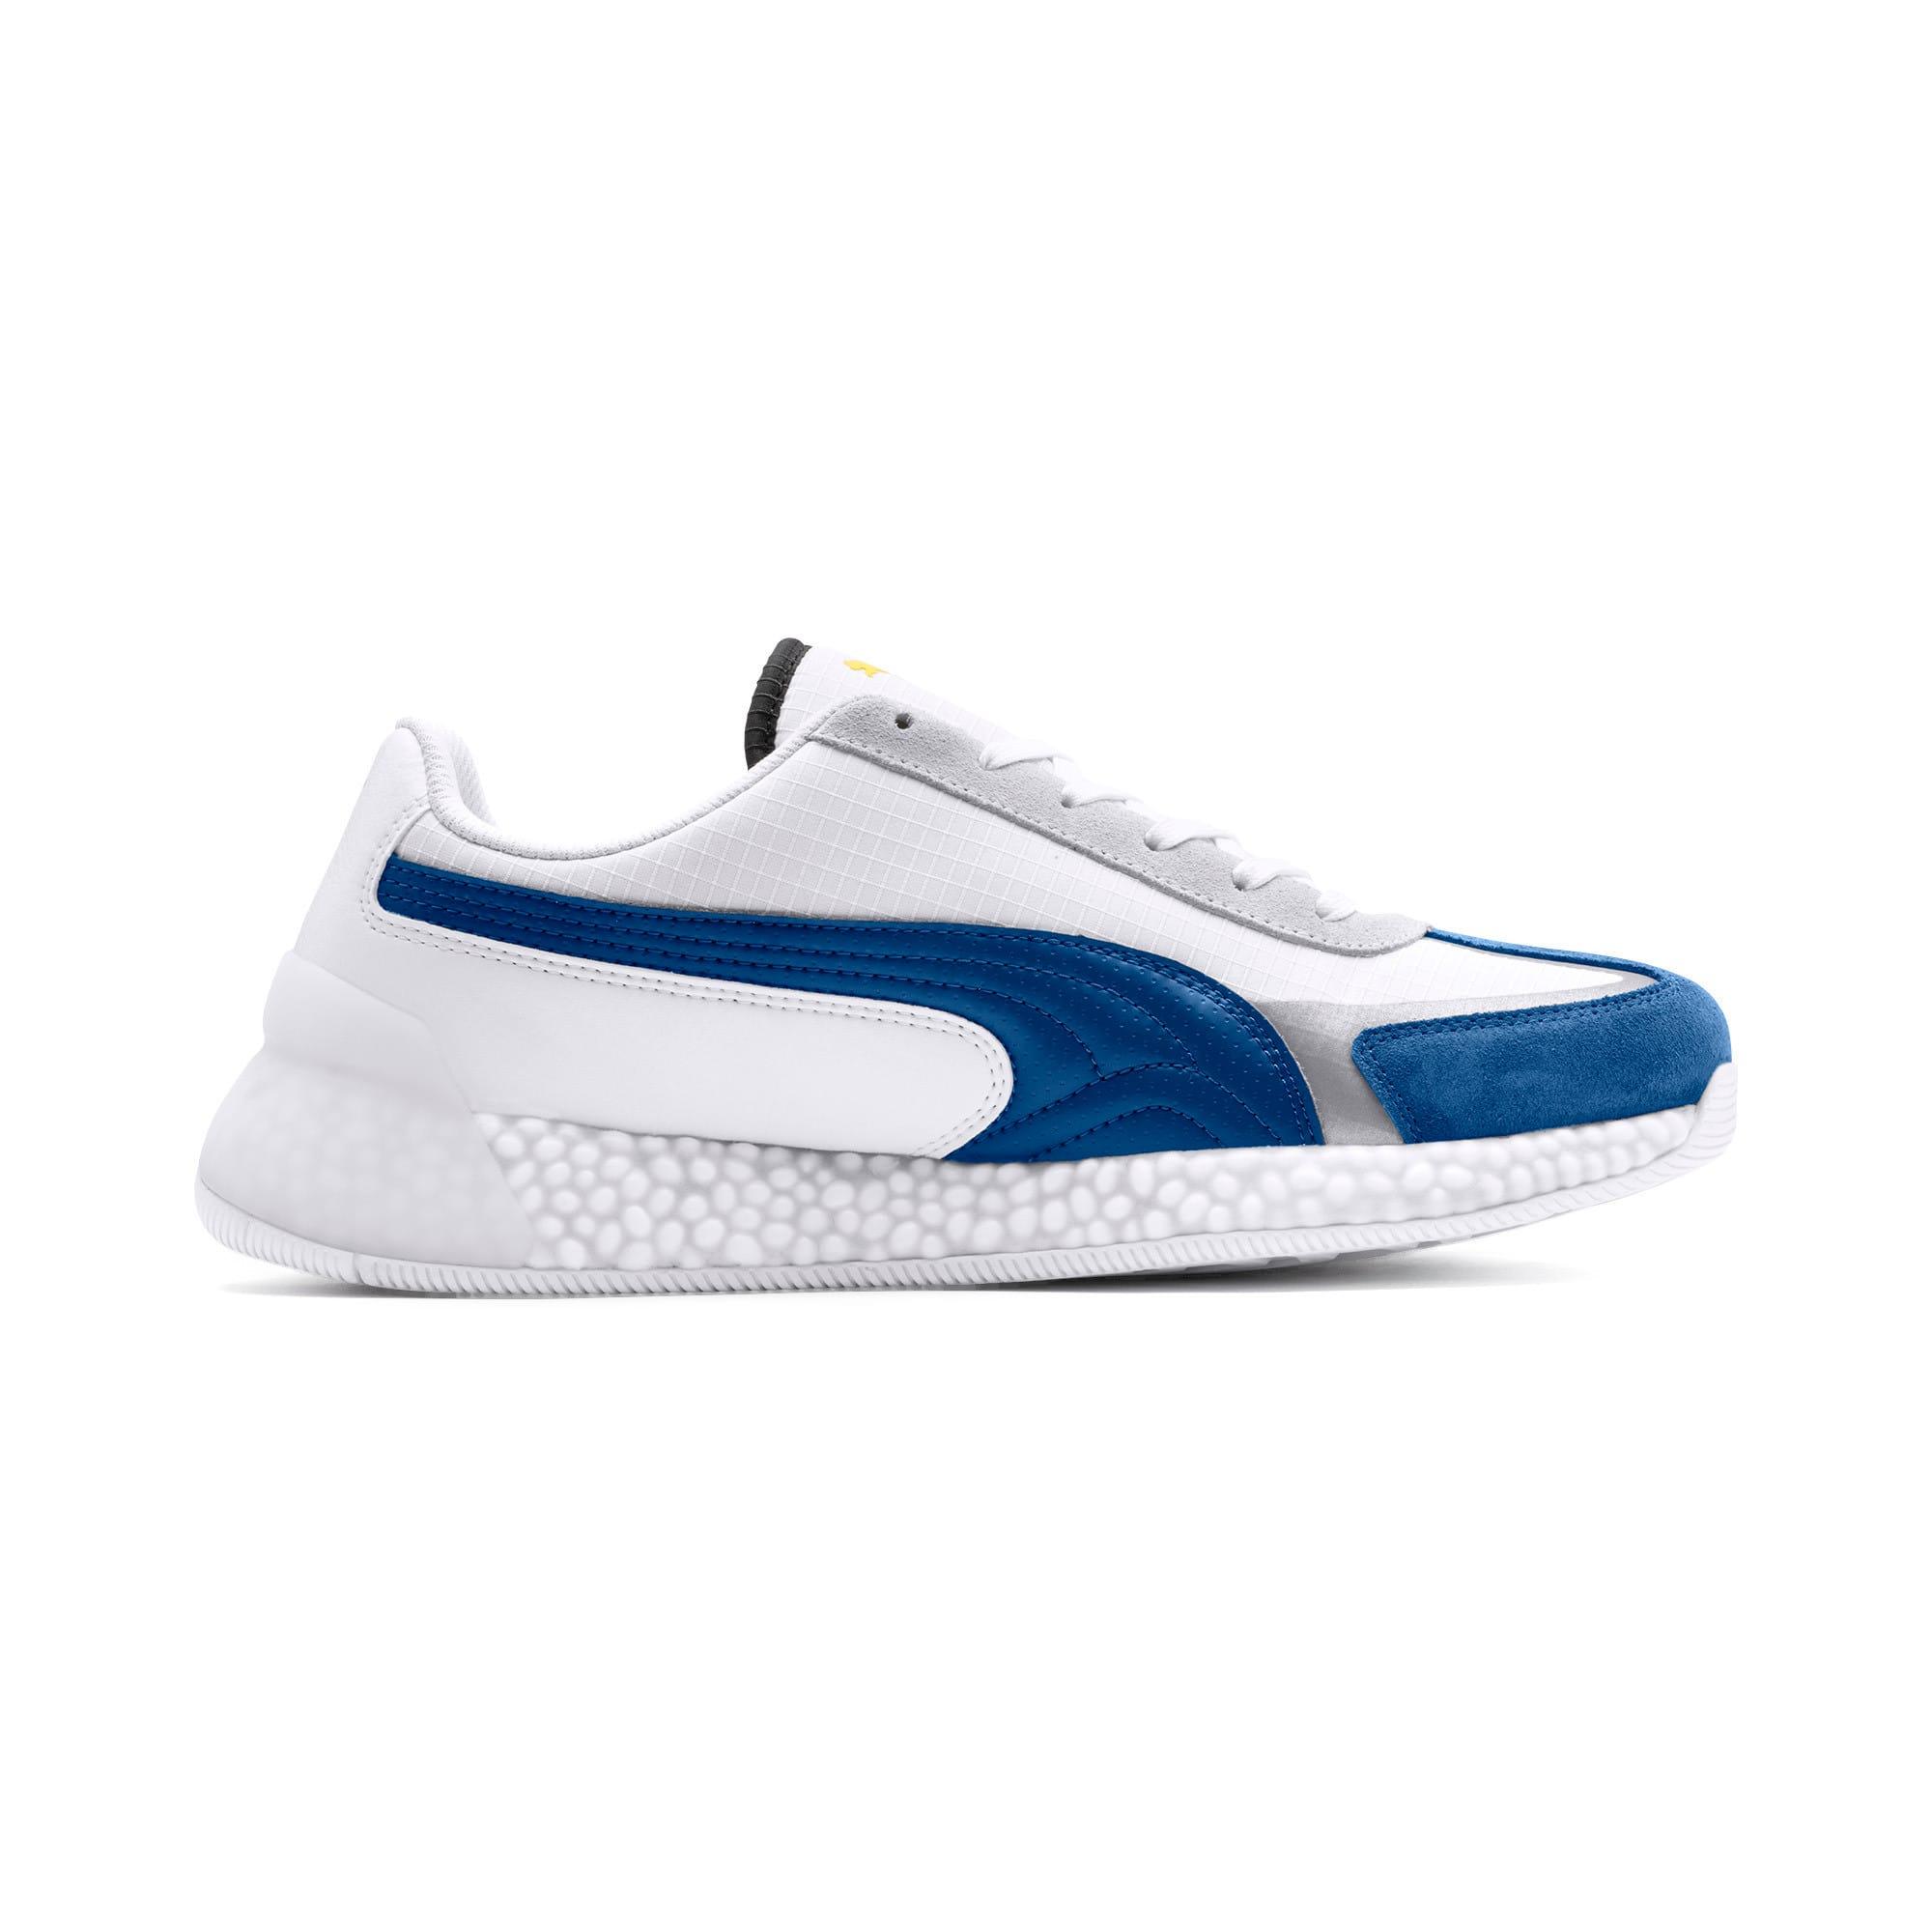 Miniatura 6 de Zapatos para correr Scuderia Ferrari Speed HYBRID, Wht-Galaxy Blue-Rosso Corsa, mediano